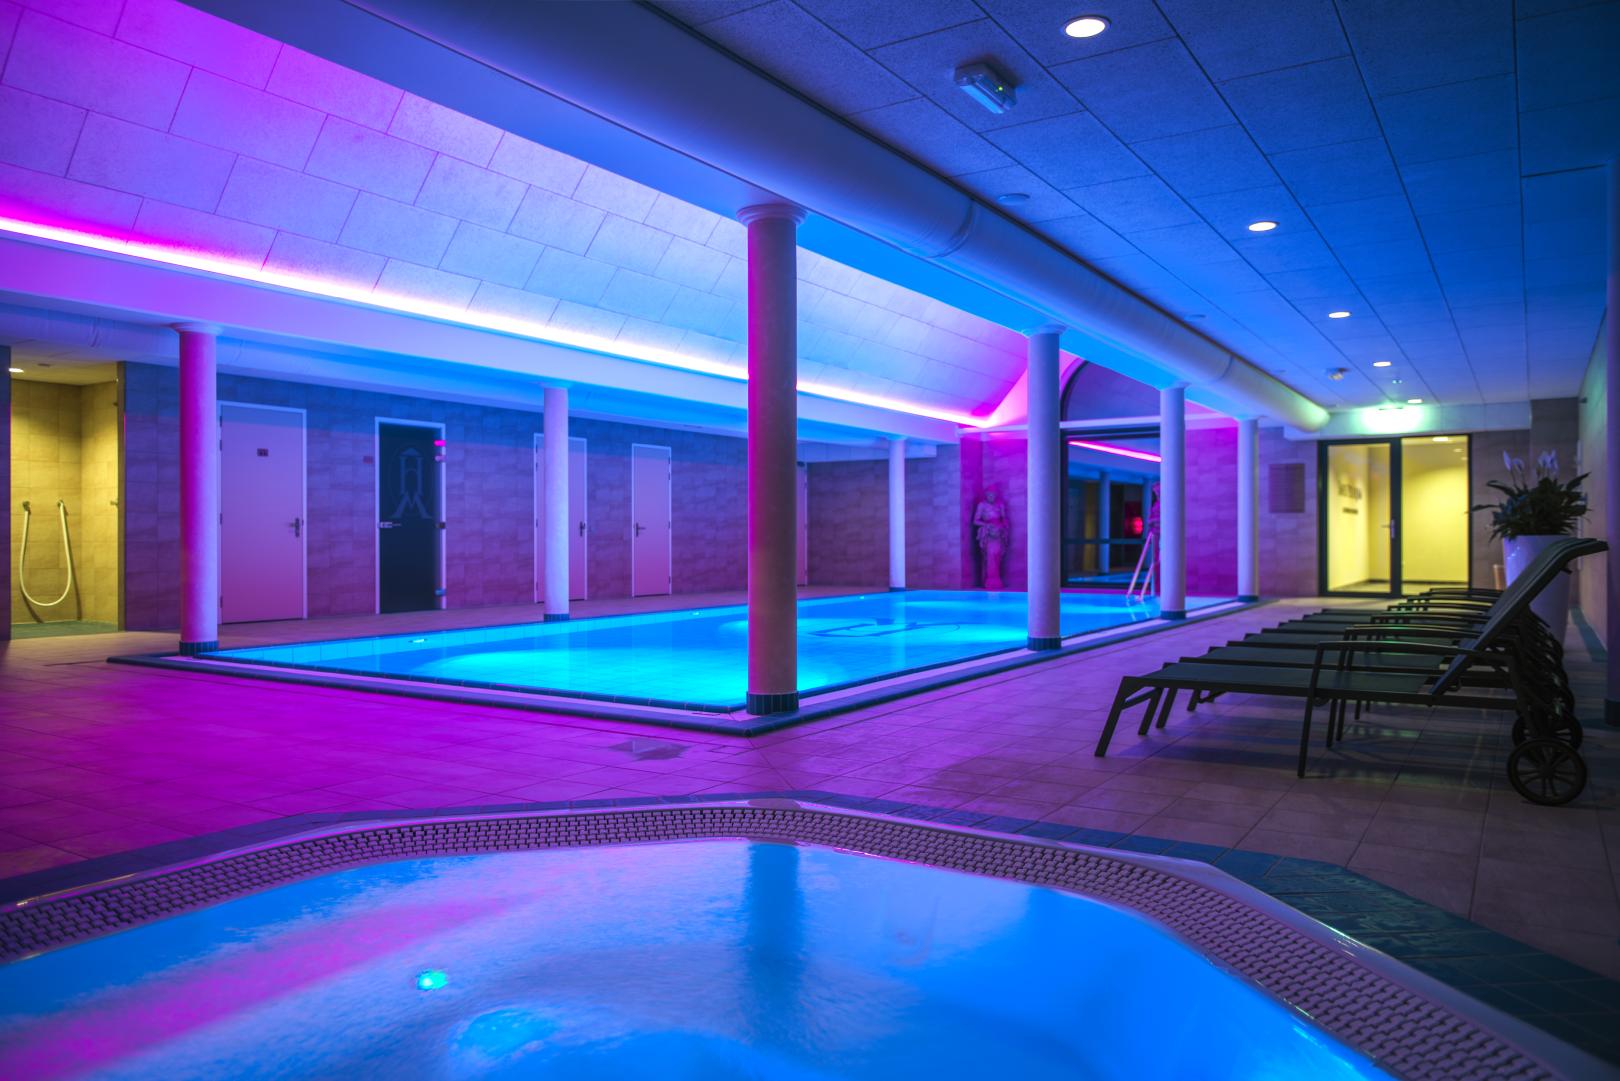 Marveld Tournament - Hotel Havezate Marveld - Spa